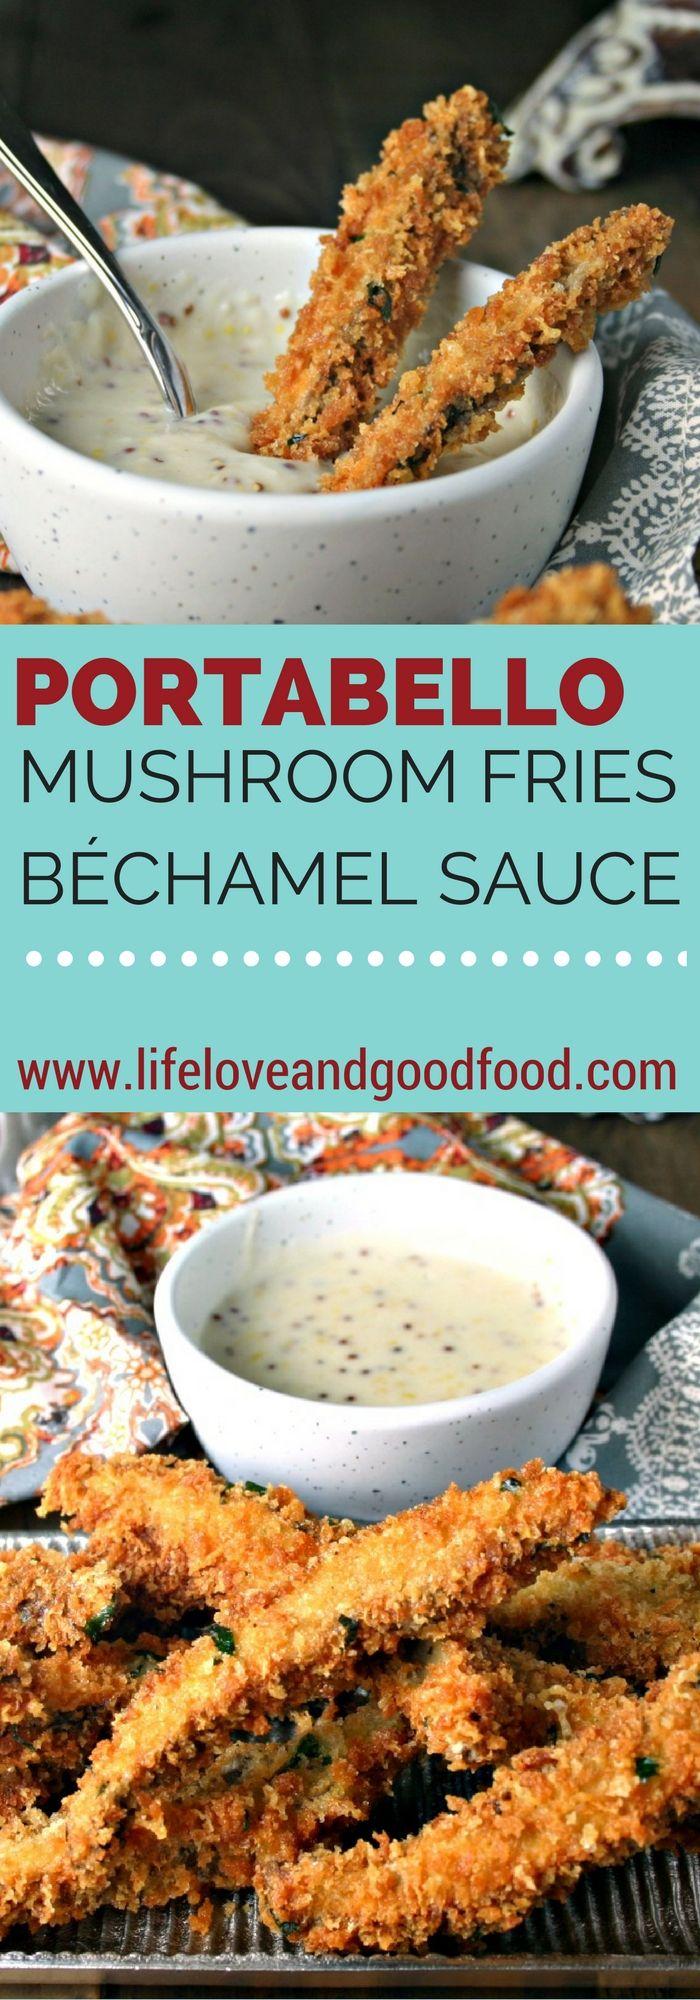 Portabello Fries with Béchamel Mustard Dipping Sauce | www.lifeloveandgo...: